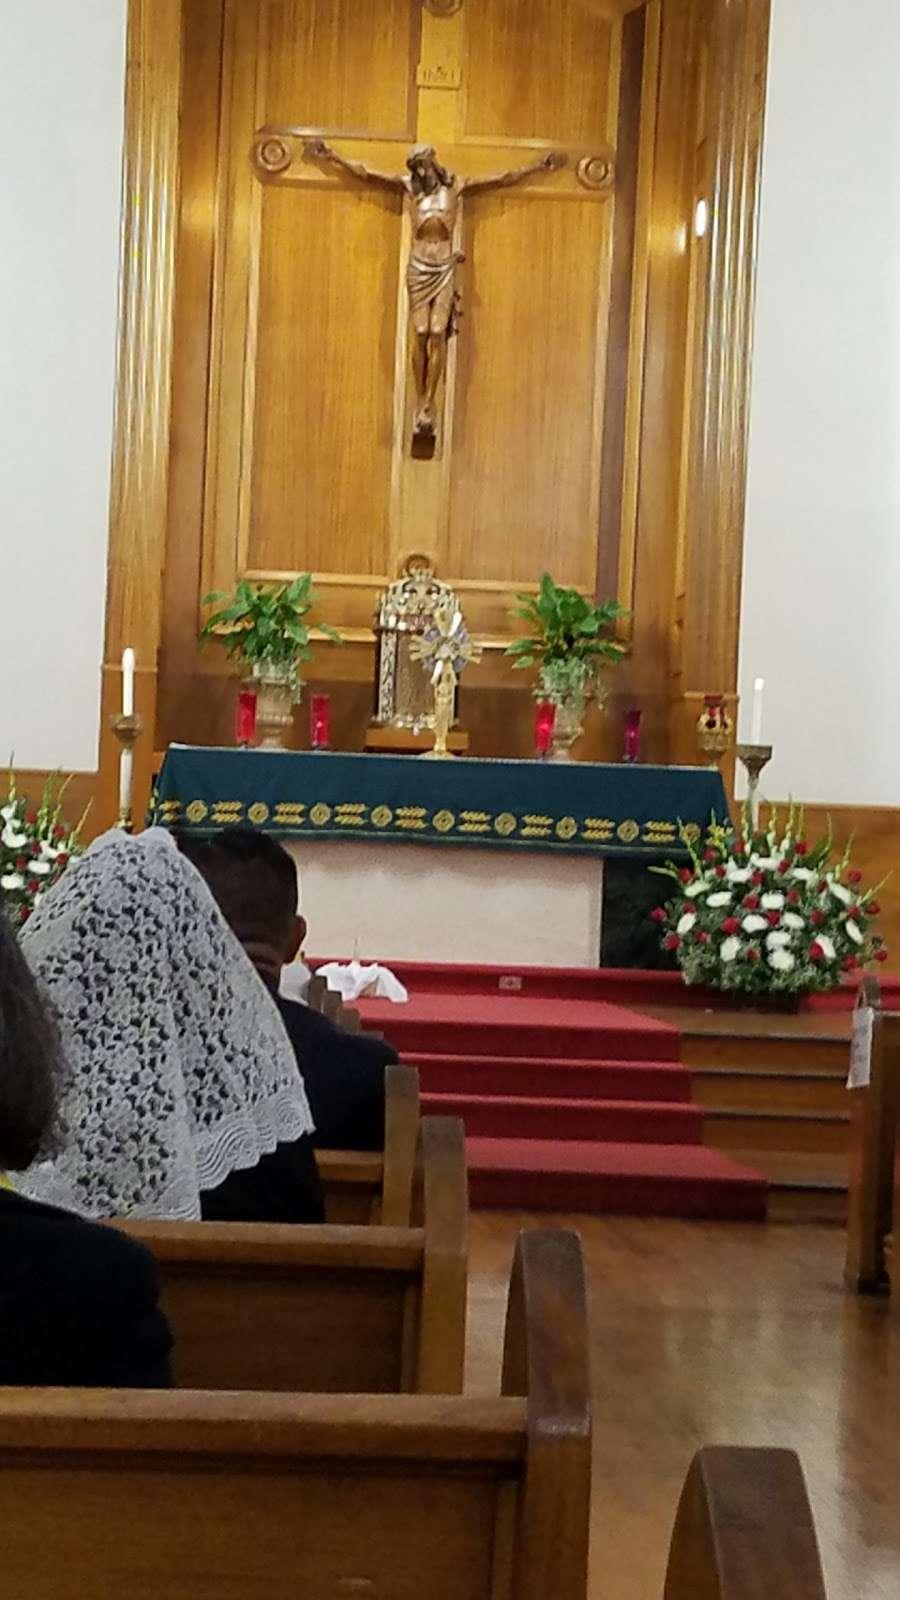 St. Anne Church - church  | Photo 2 of 10 | Address: 1344 S Main St, Santa Ana, CA 92707, USA | Phone: (714) 835-7434